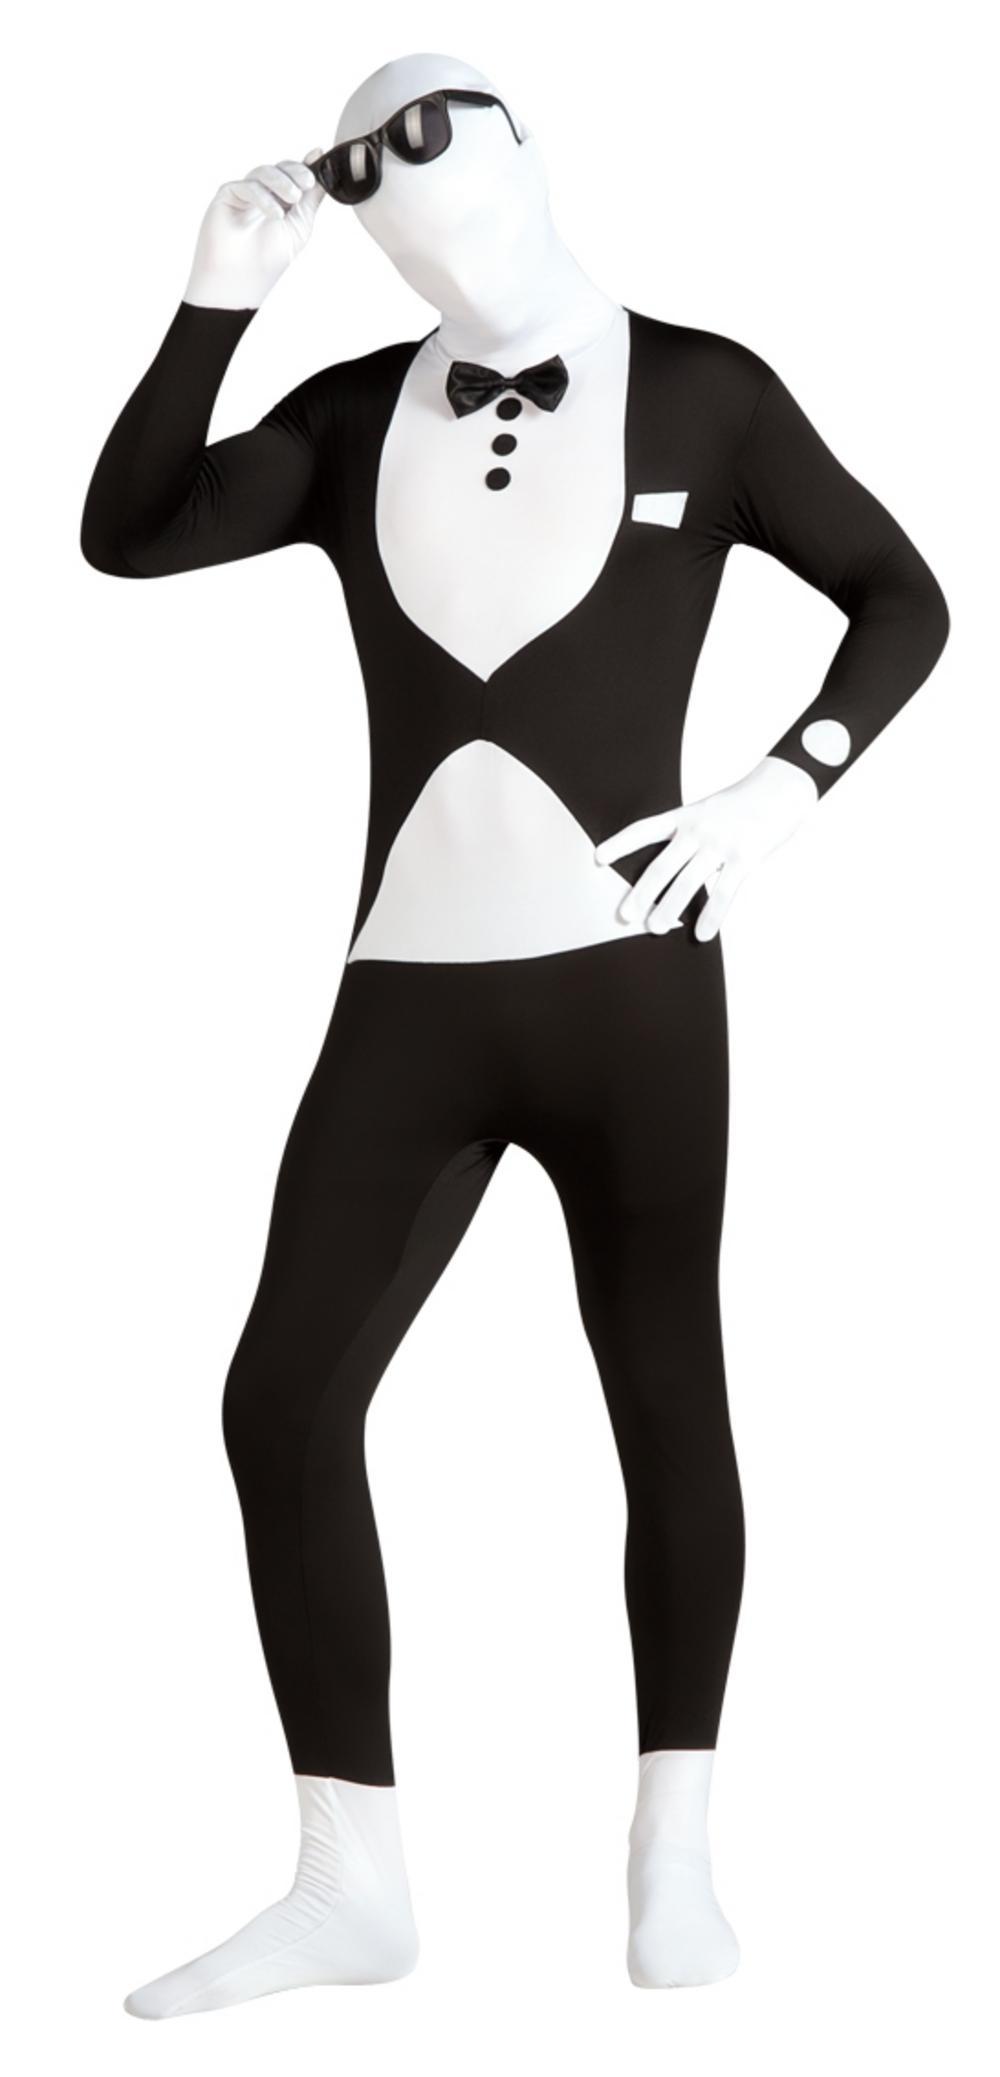 tuxedo second skin suit stag party costumes mega fancy dress. Black Bedroom Furniture Sets. Home Design Ideas